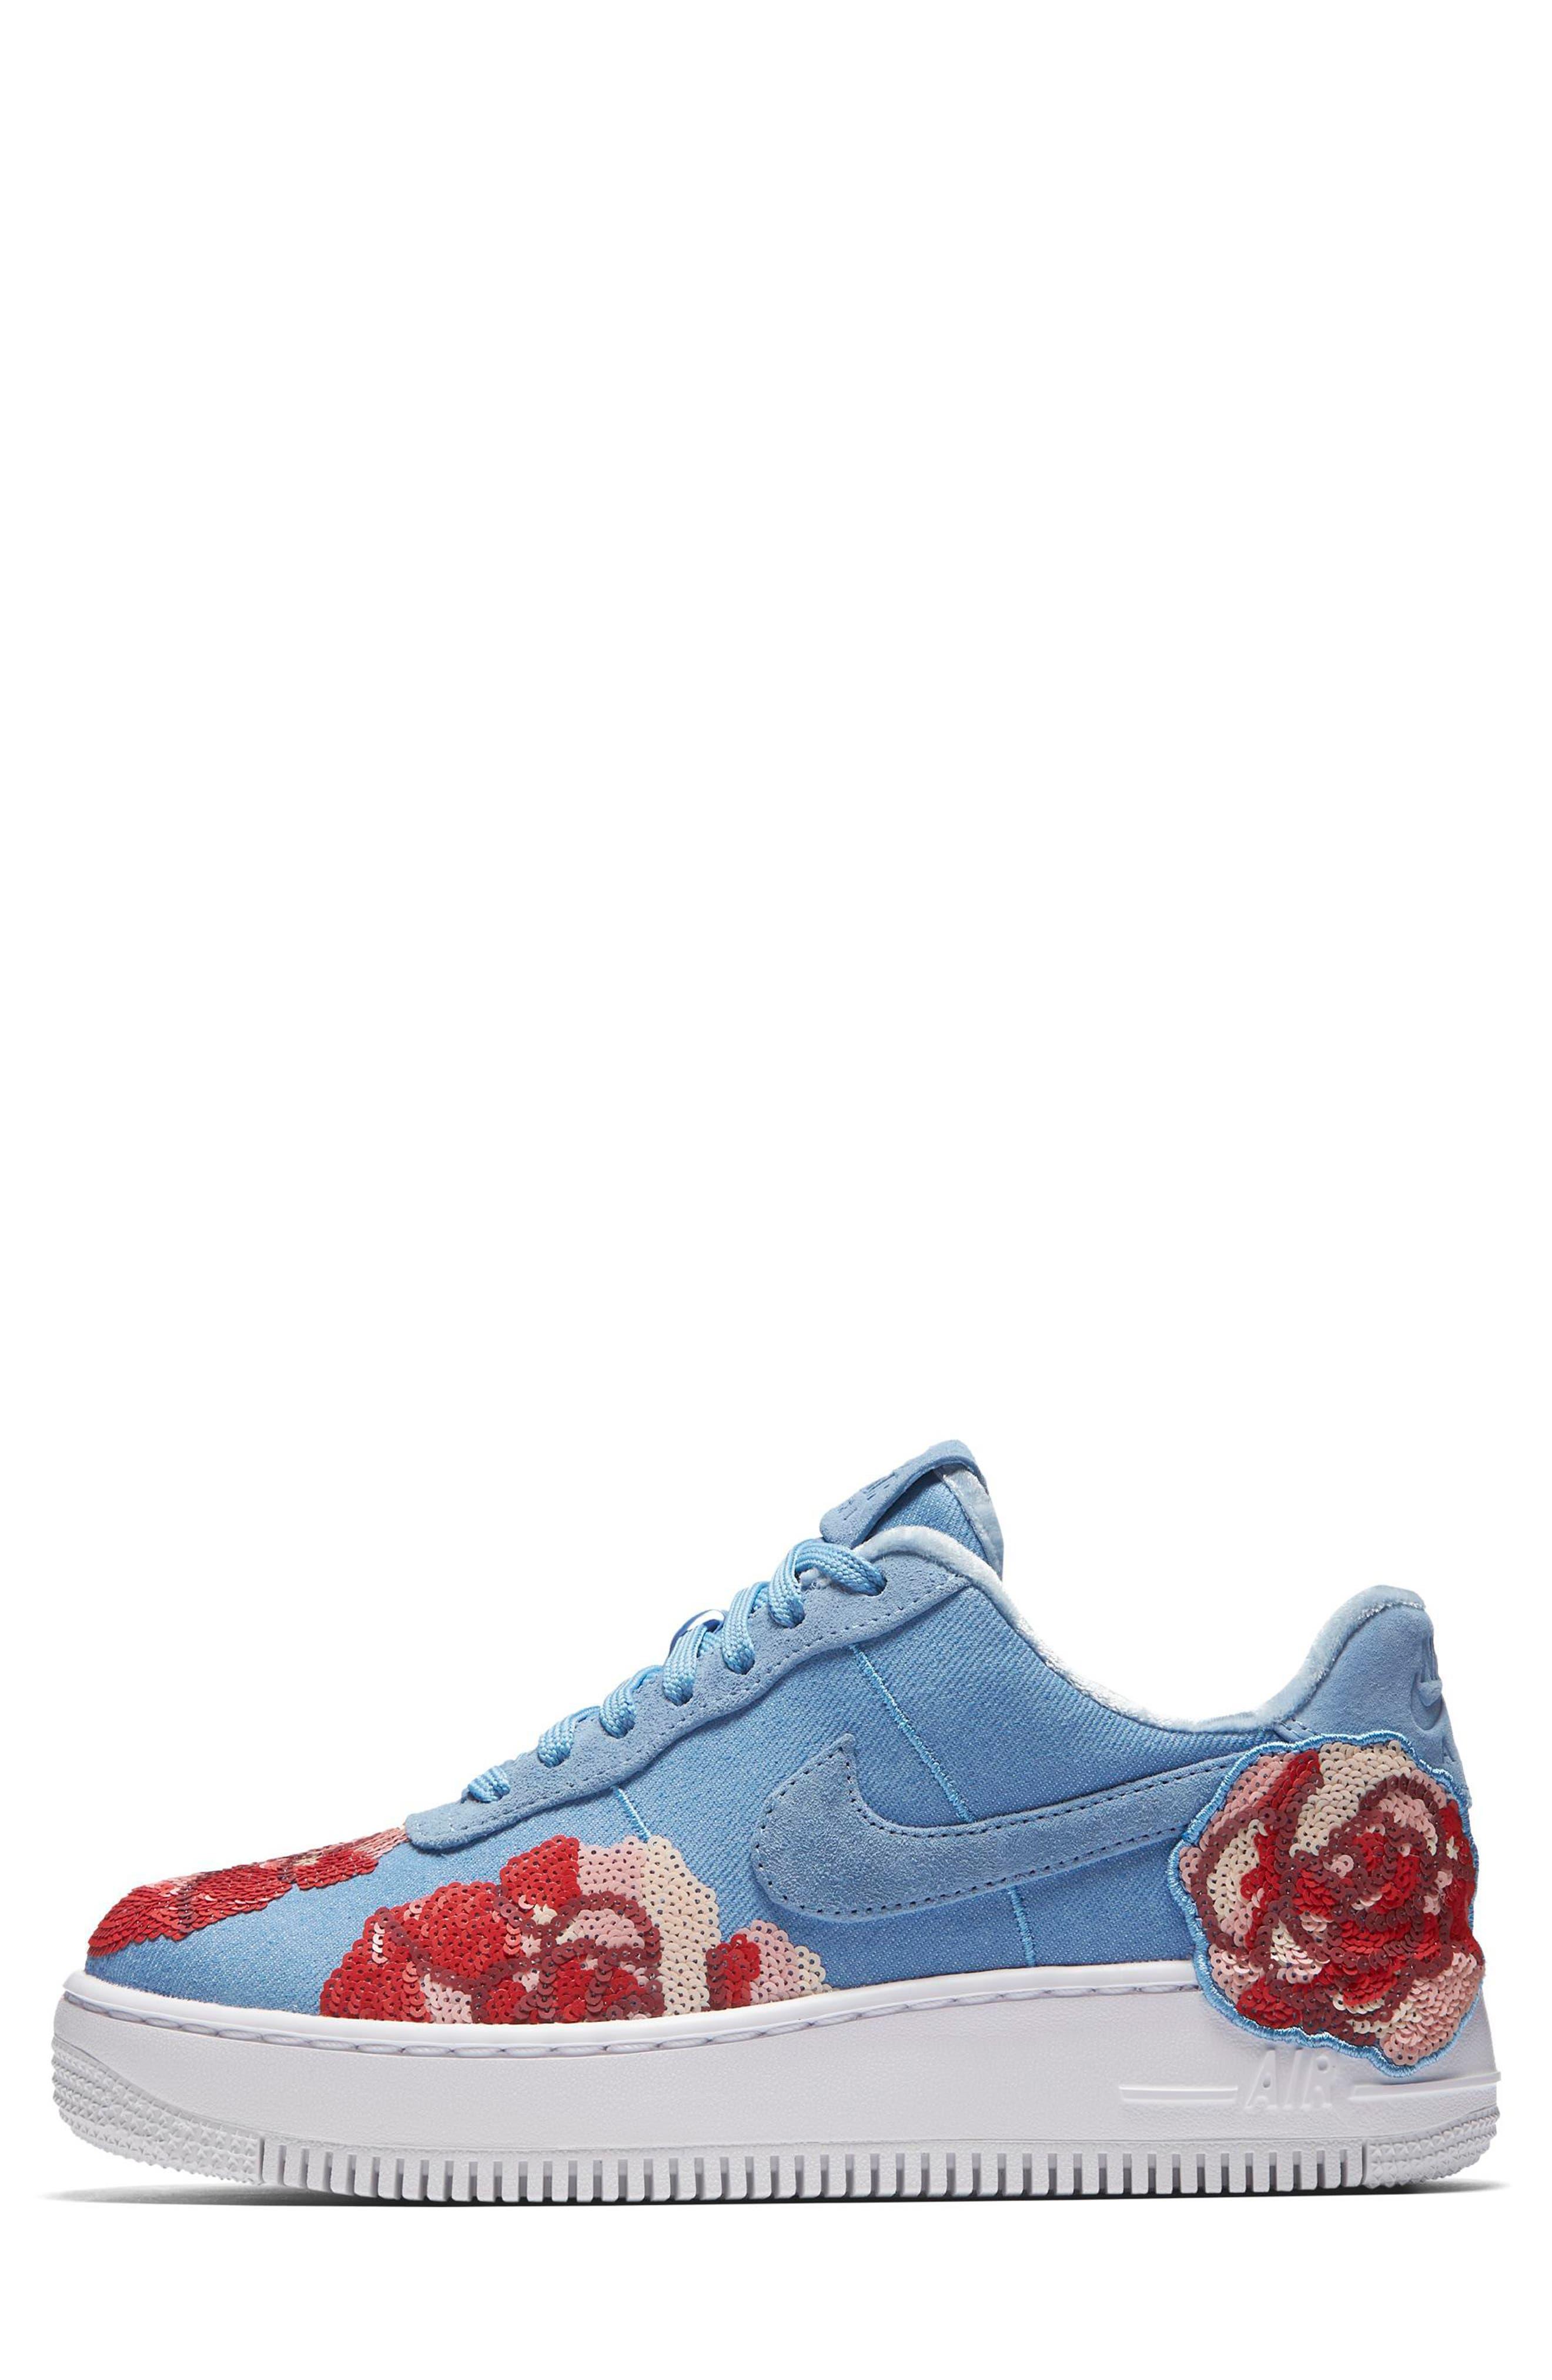 Alternate Image 3  - Nike Women's Air Force 1 Upstep LX Shoe (Women)